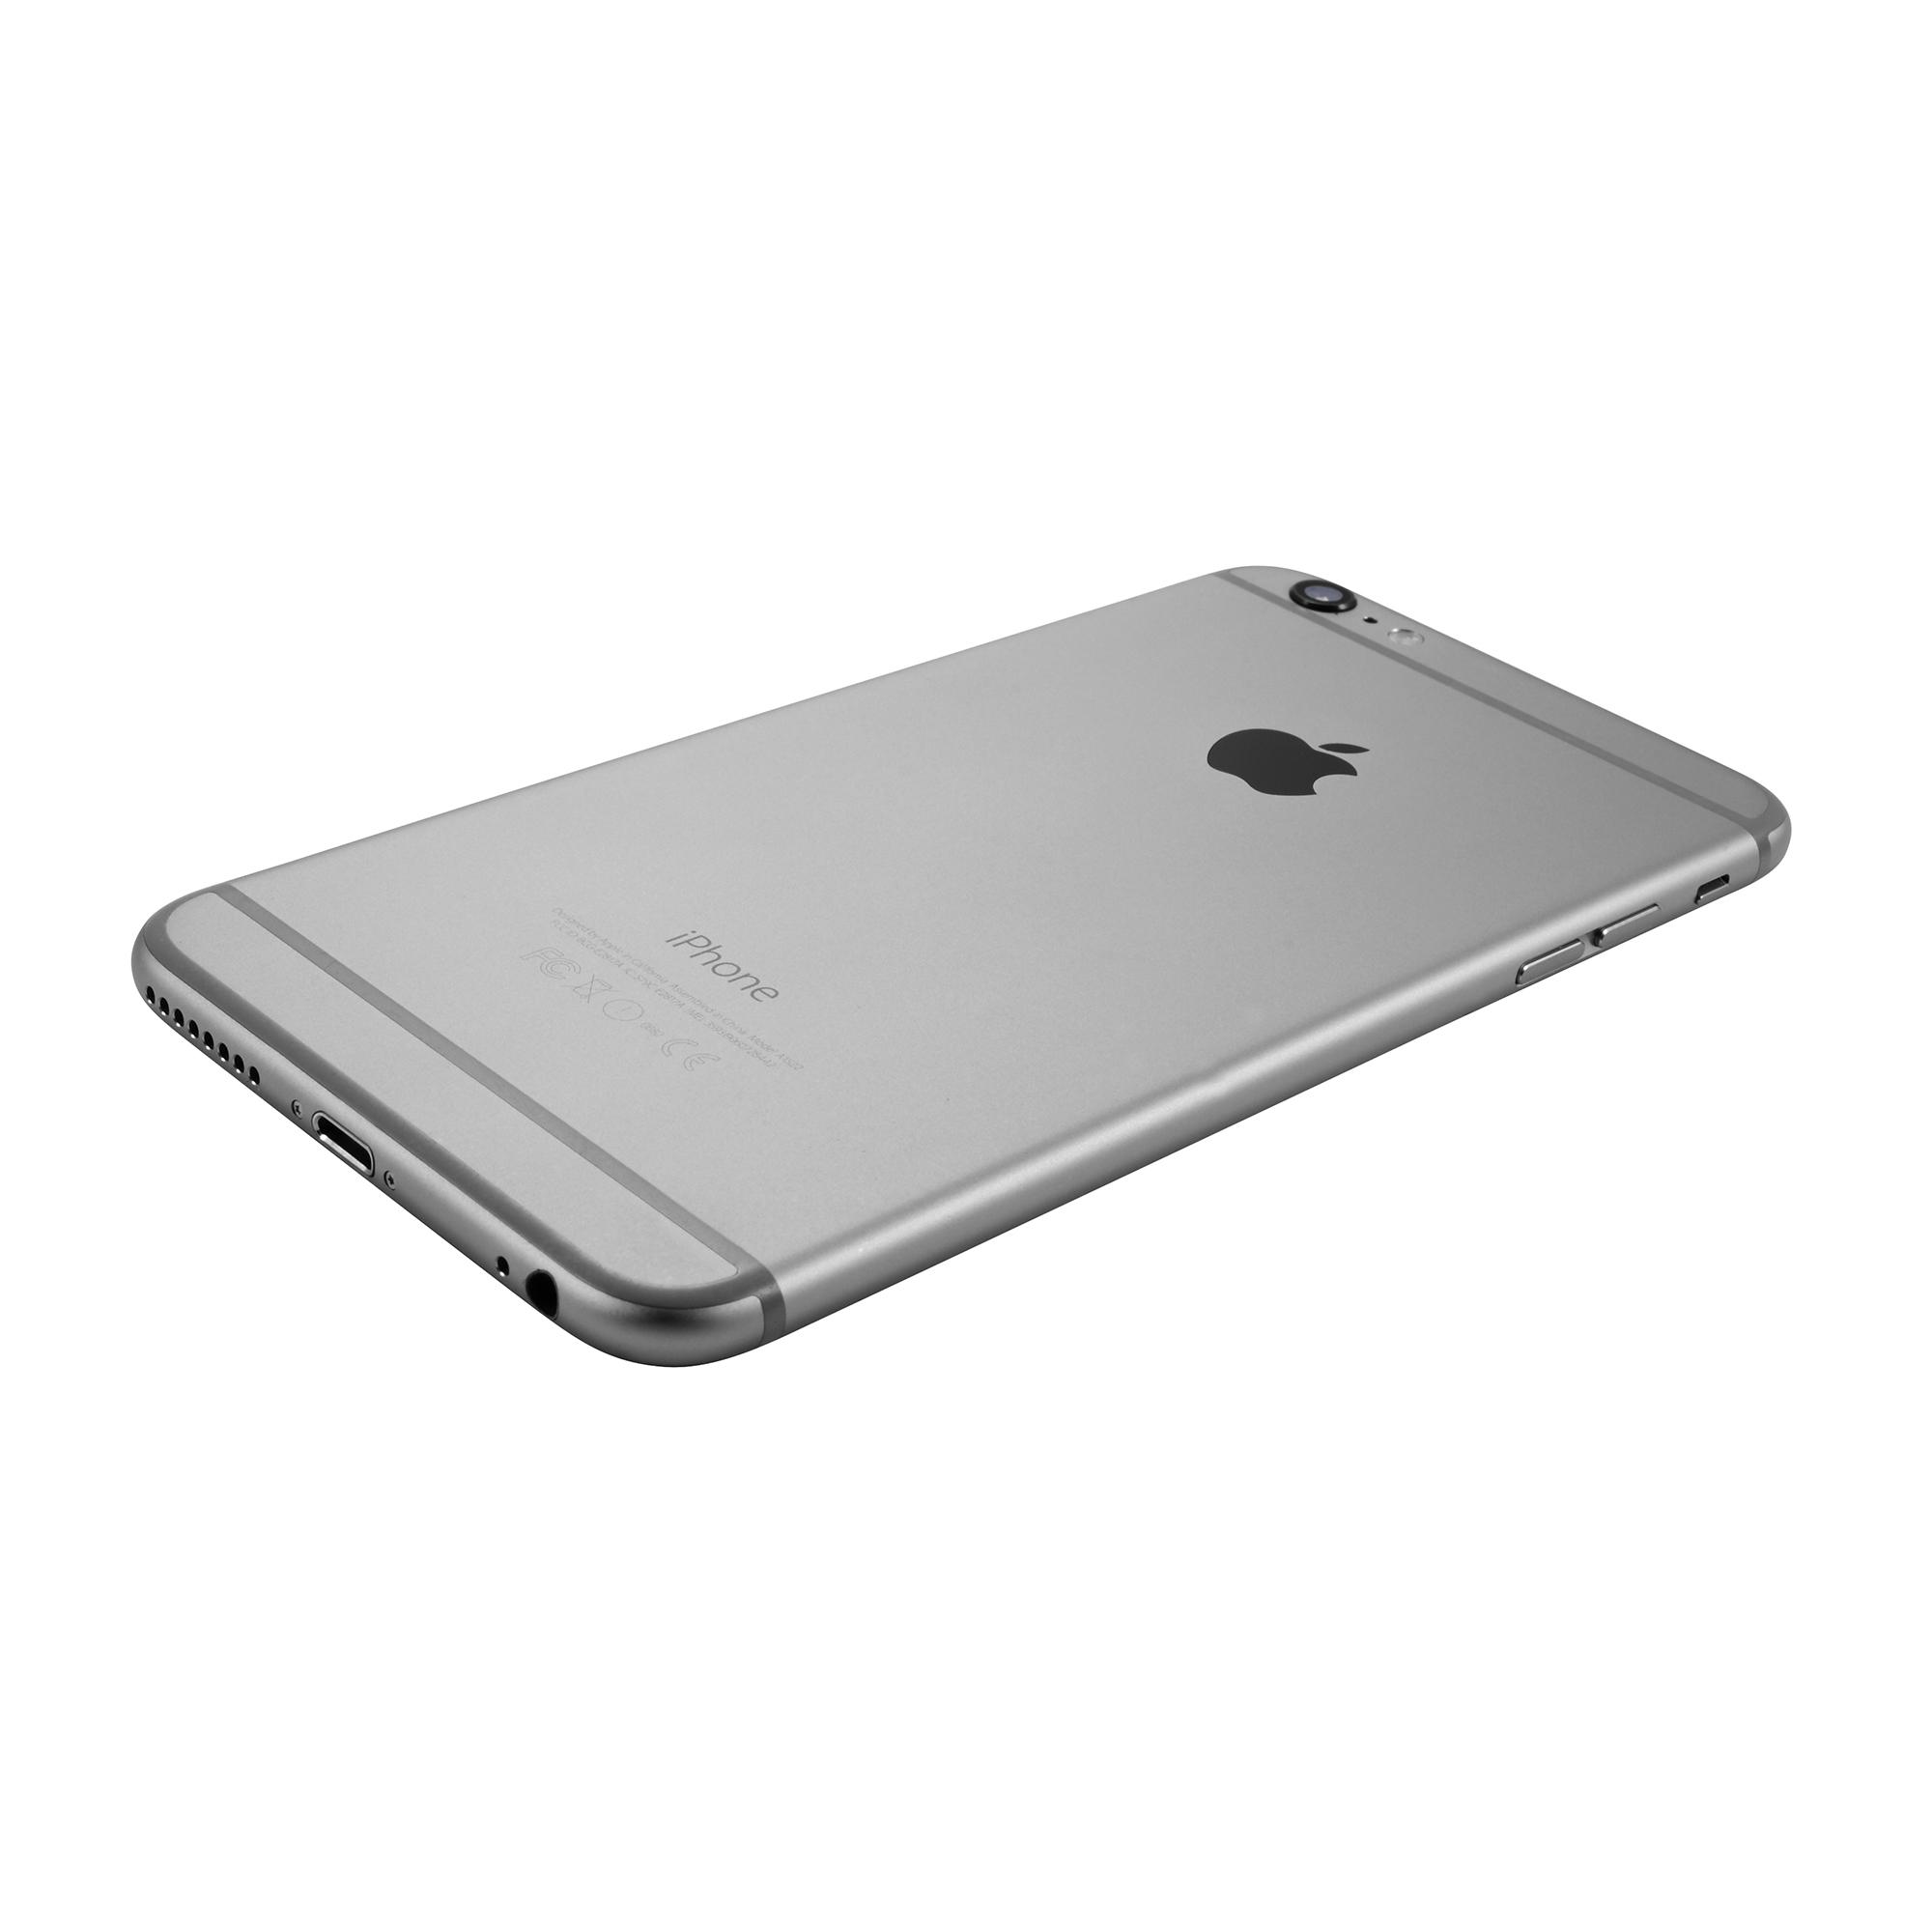 Apple-iPhone-6-Plus-a1522-16GB-LTE-CDMA-GSM-Unlocked-Very-Good thumbnail 5